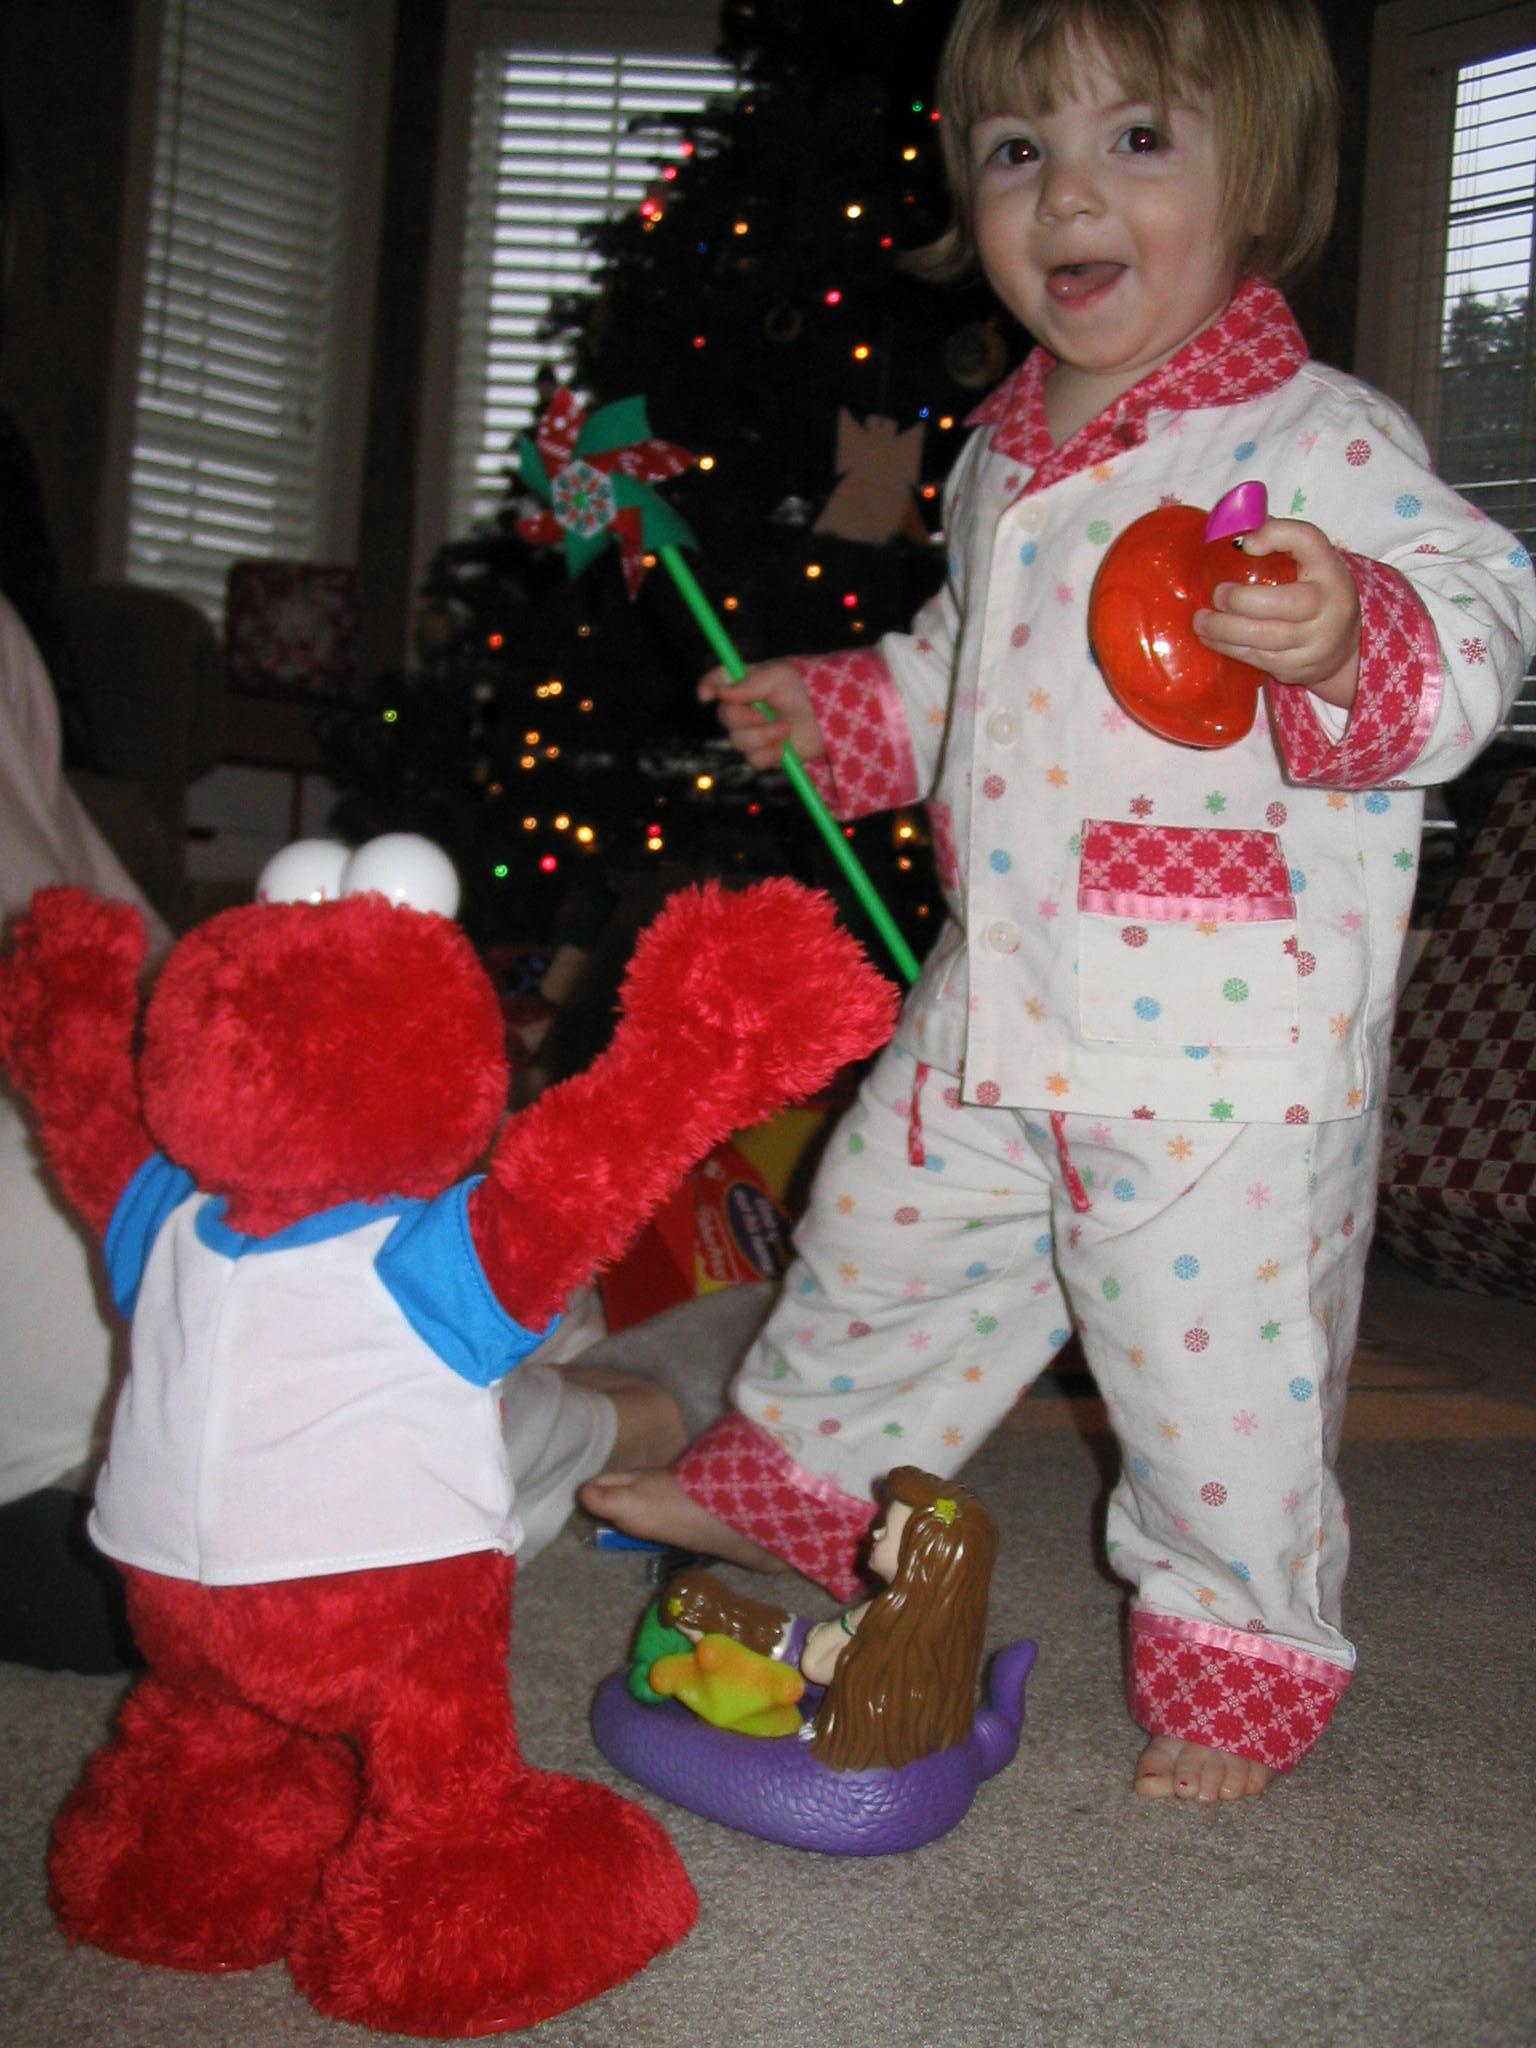 Dancin' with Elmo!